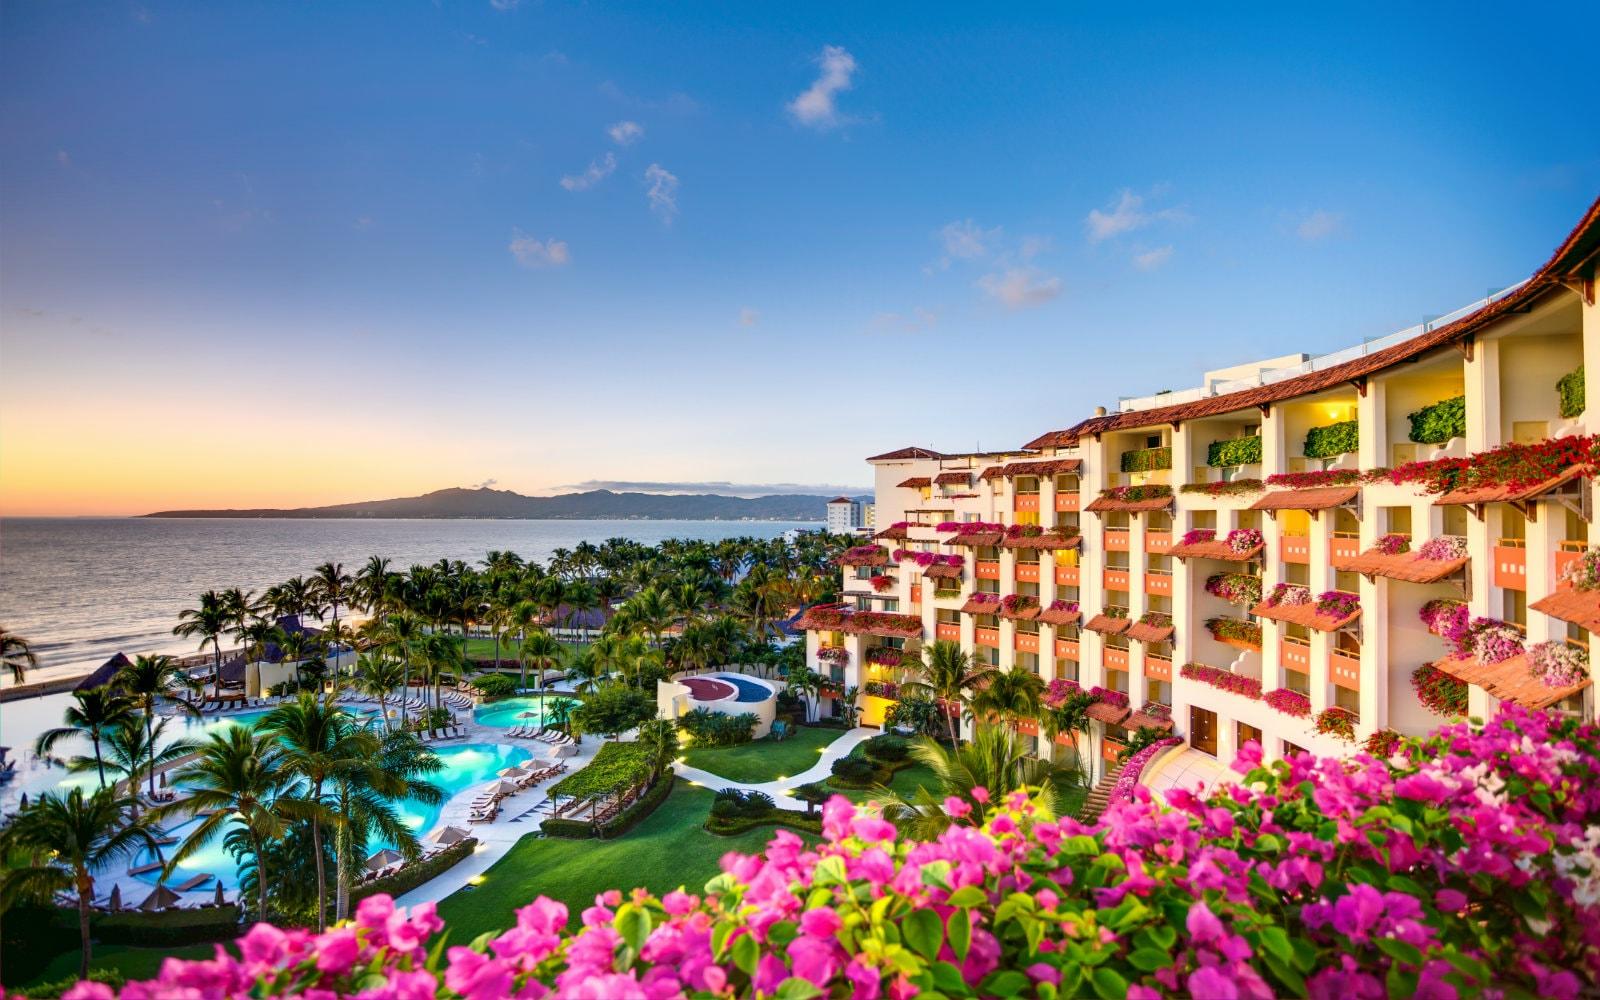 Luxury Puerto Vallarta Mexico Resort Grand Velas Riviera Nayarit